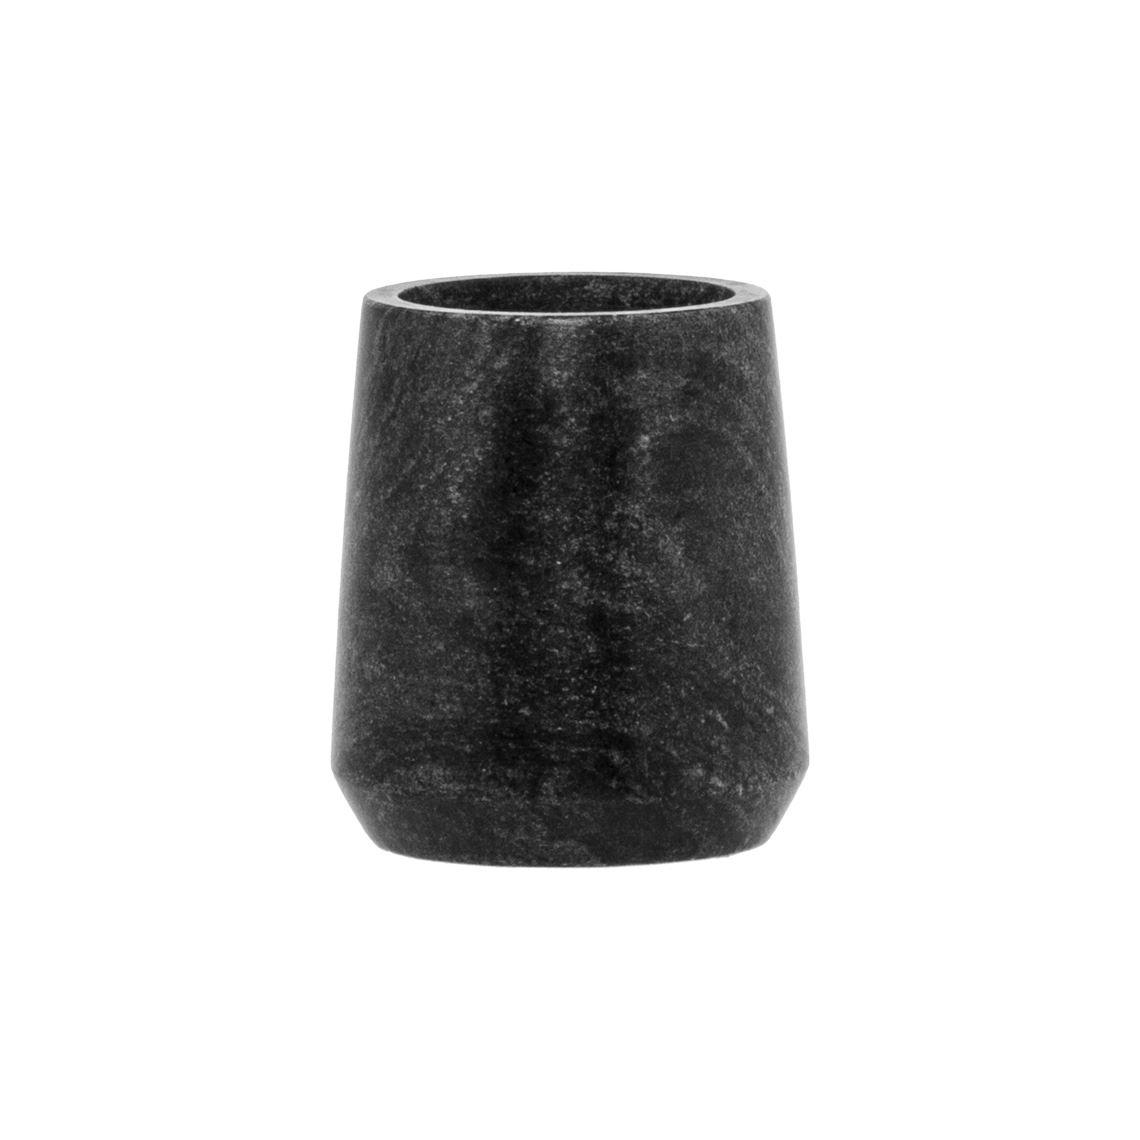 Marble Tumbler Size W 9cm x D 9cm x H 10cm in Black Freedom